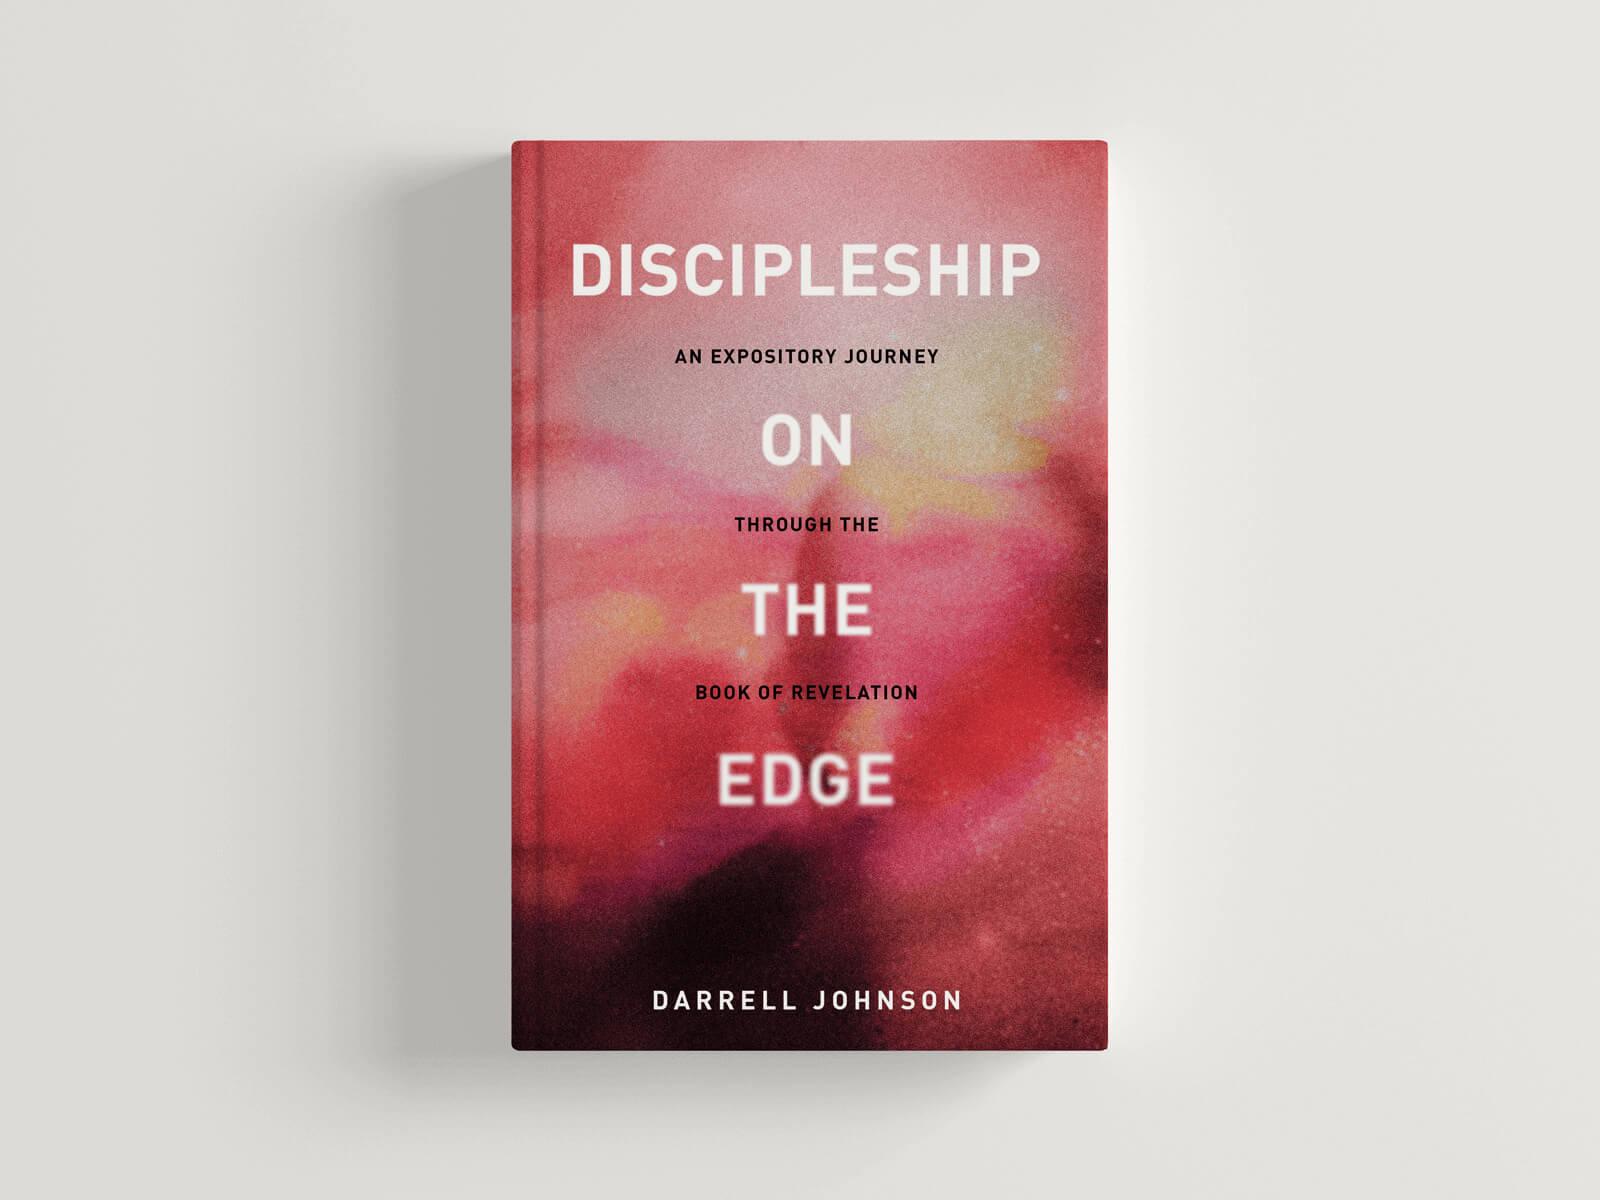 Discipleship on the Edge Darrell Johnson